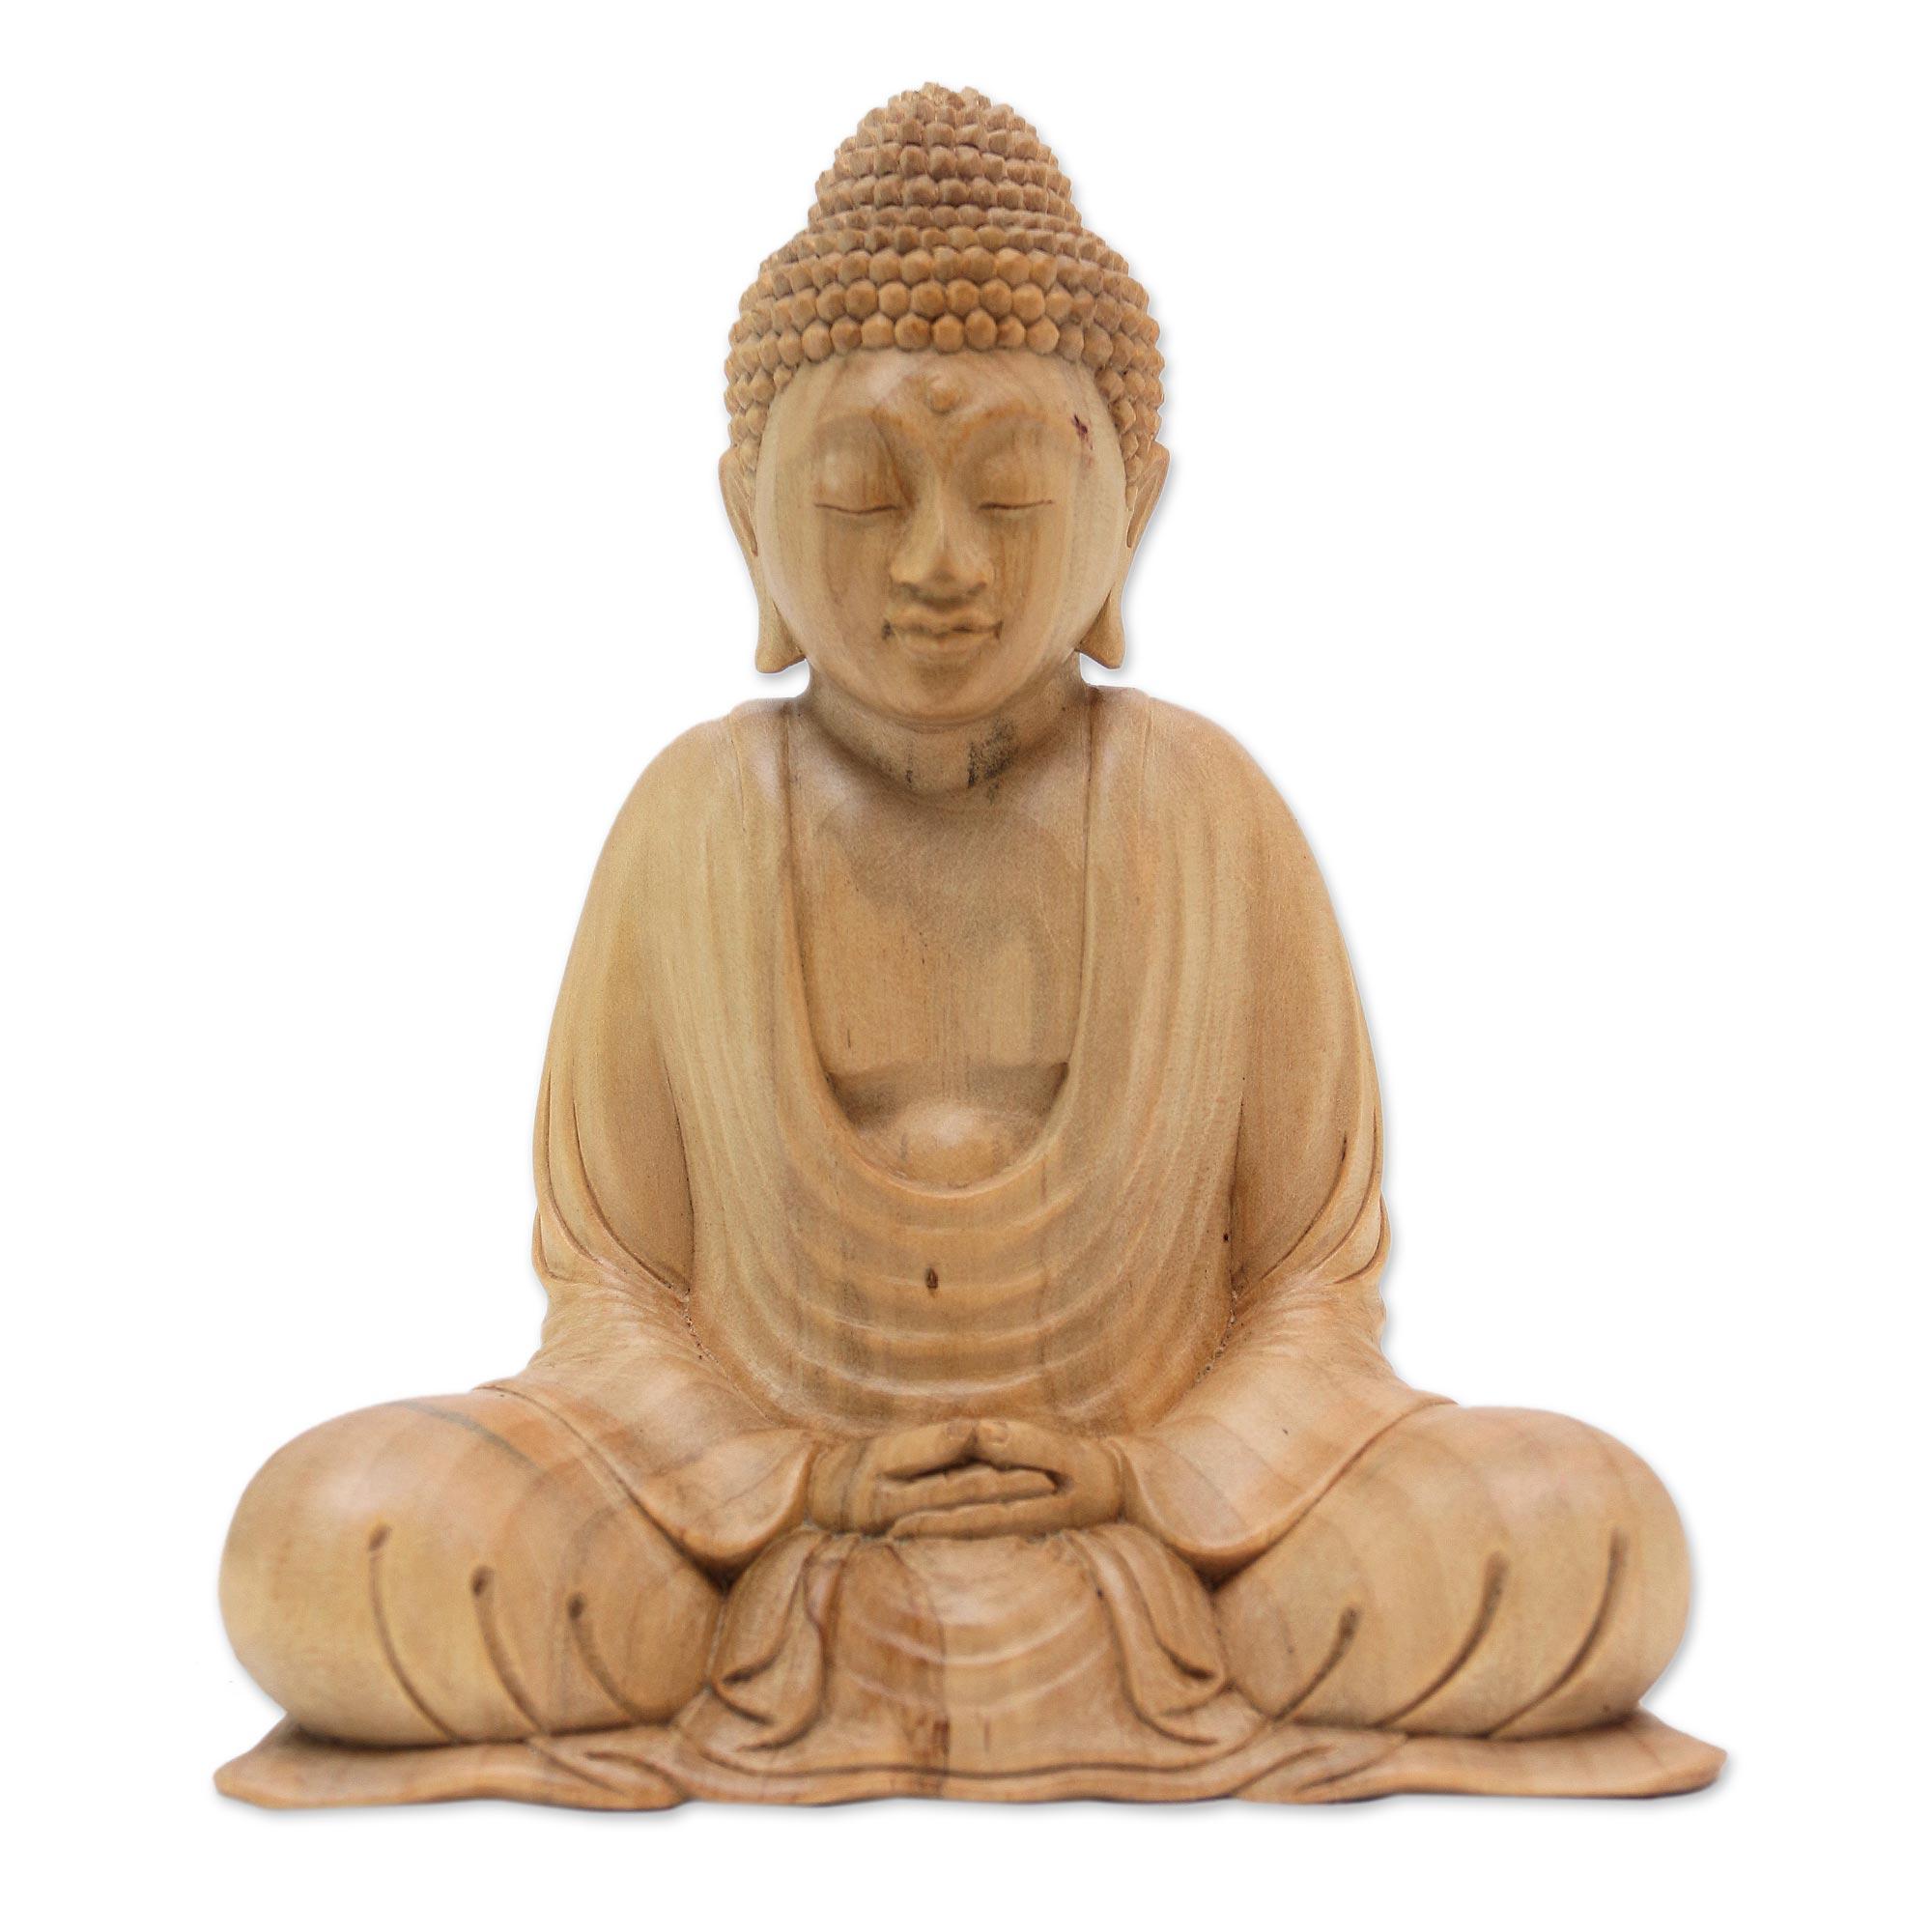 BUDDHA HOME DECOR - Buddha Home Decor Collection at NOVICA